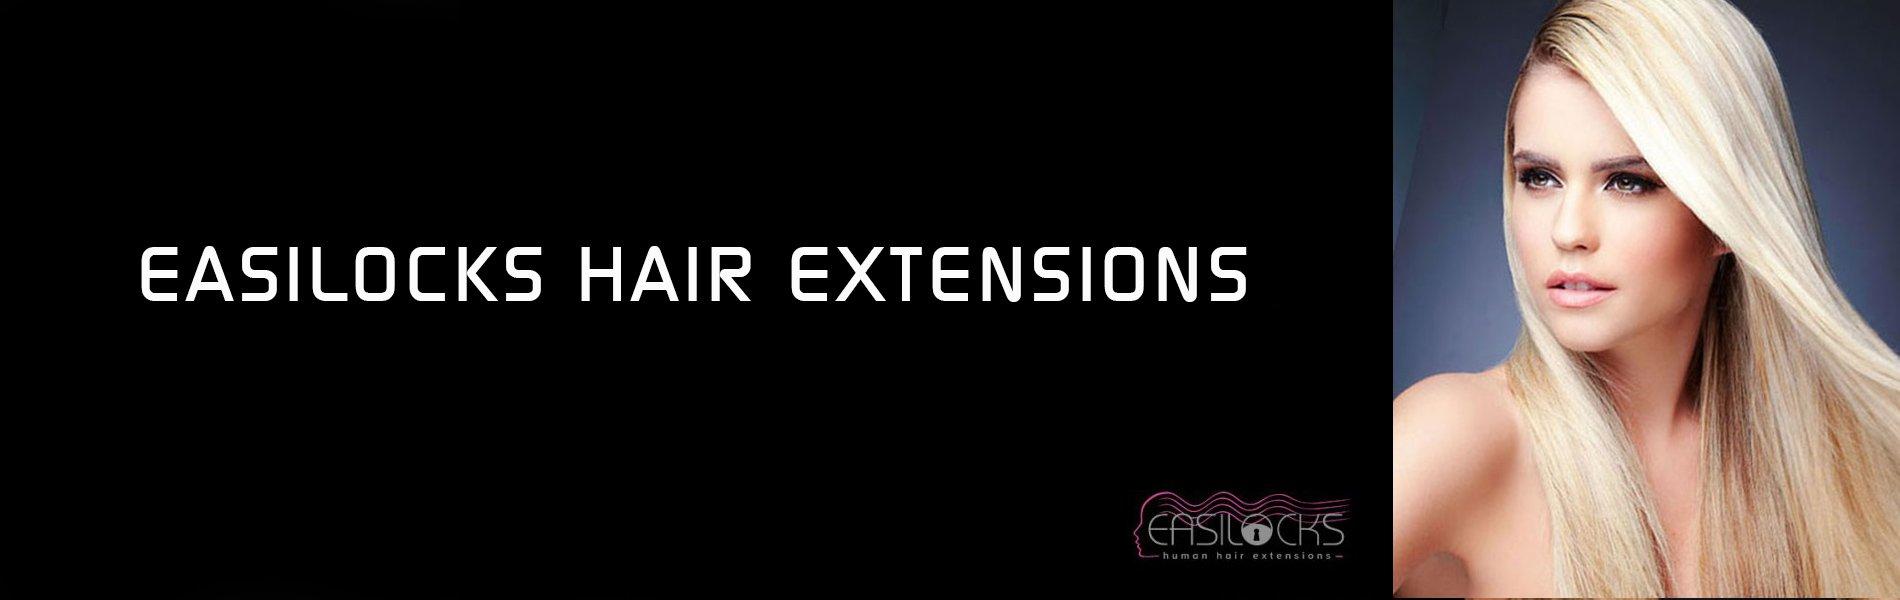 Easilocks Hair Extensions Uxbridge Hair Salon